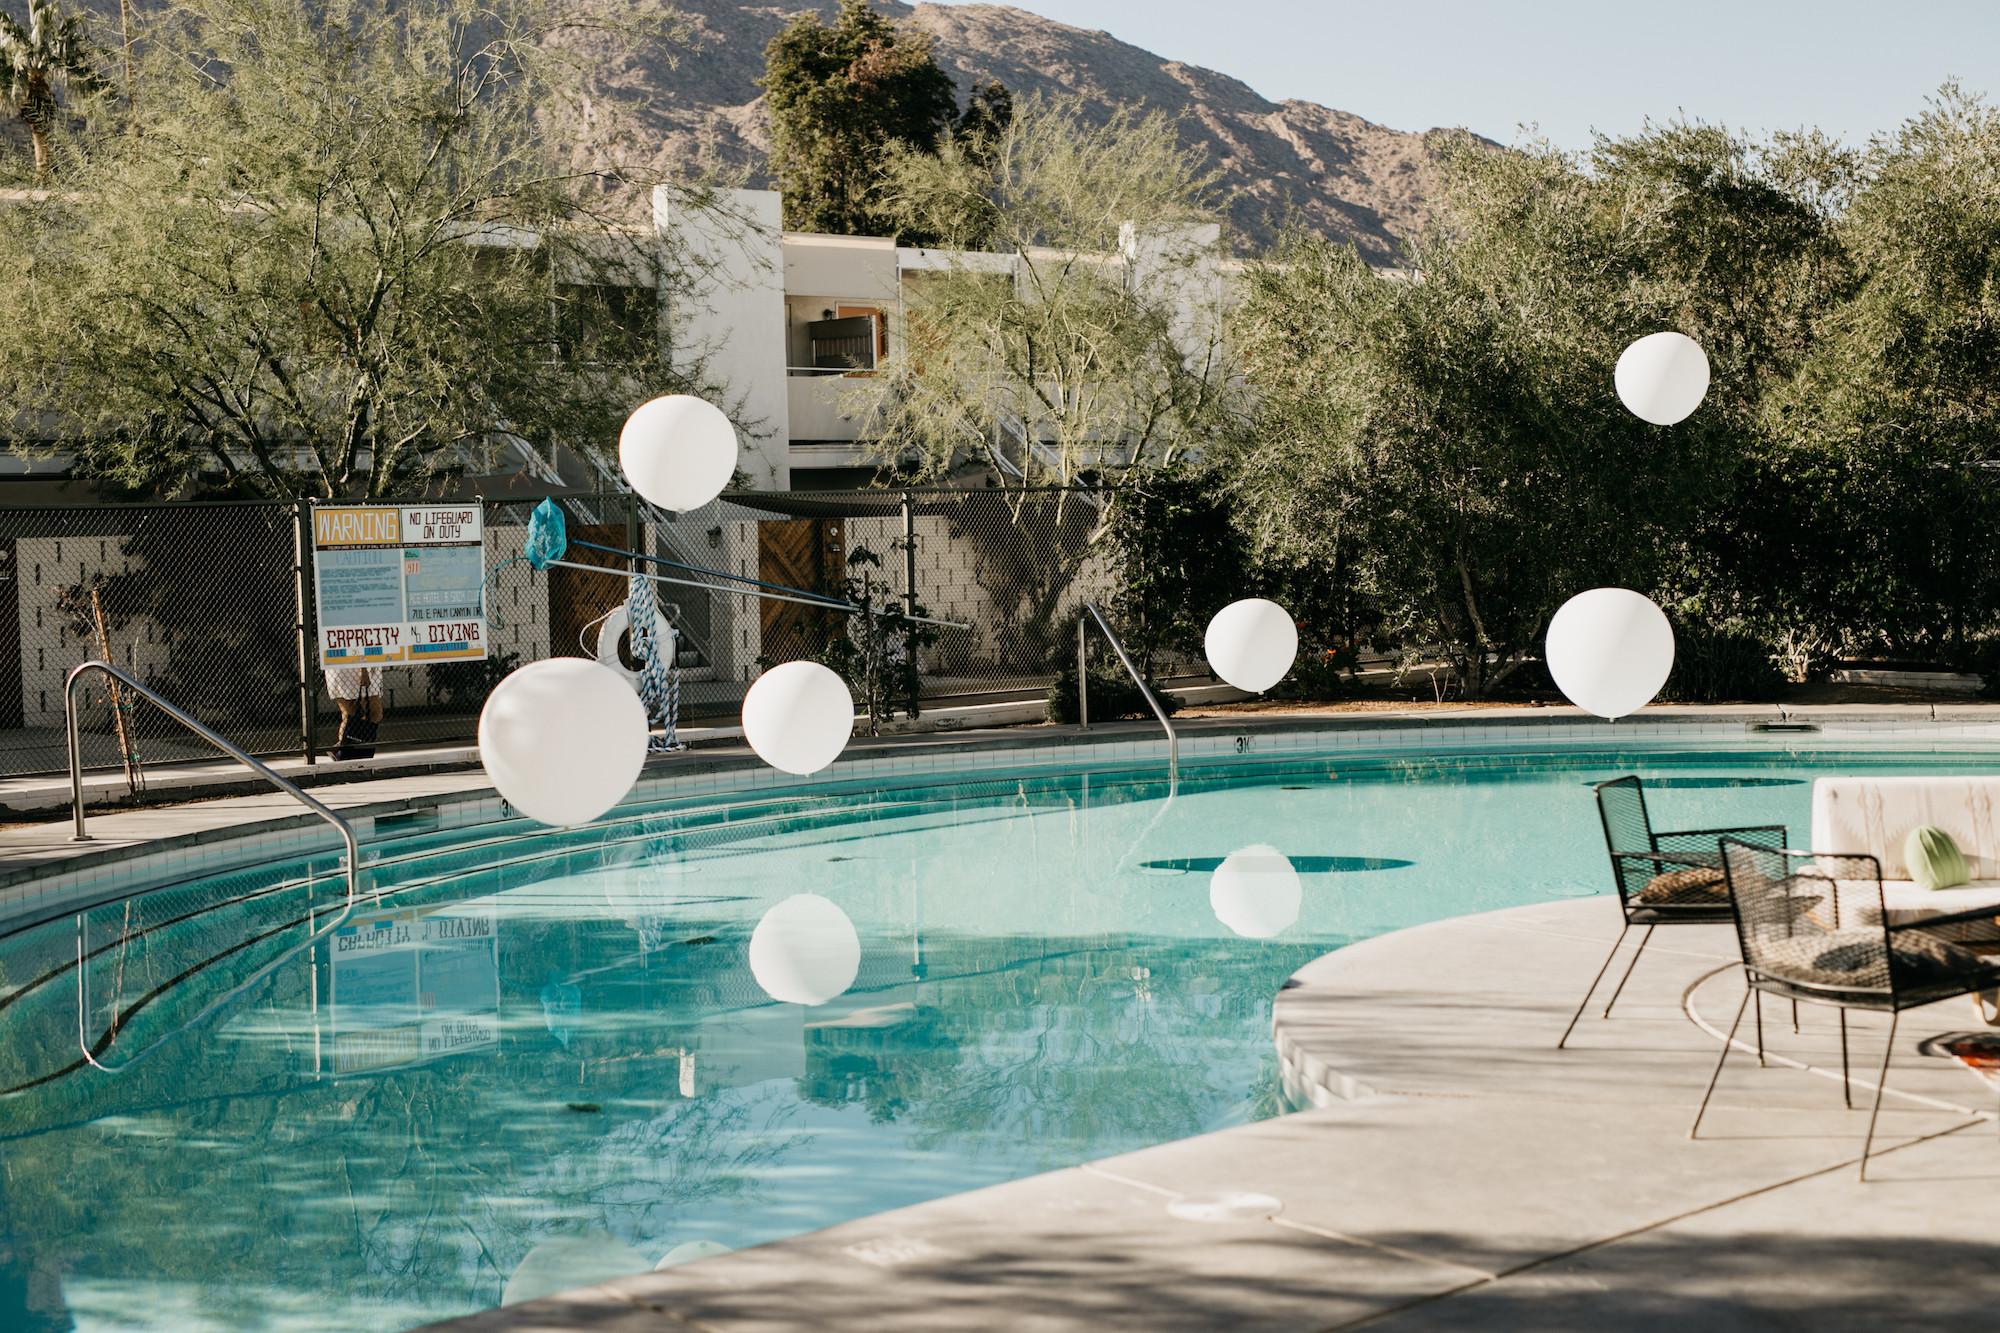 ace-hotel-palm-springs-wedding-photographer424.jpg